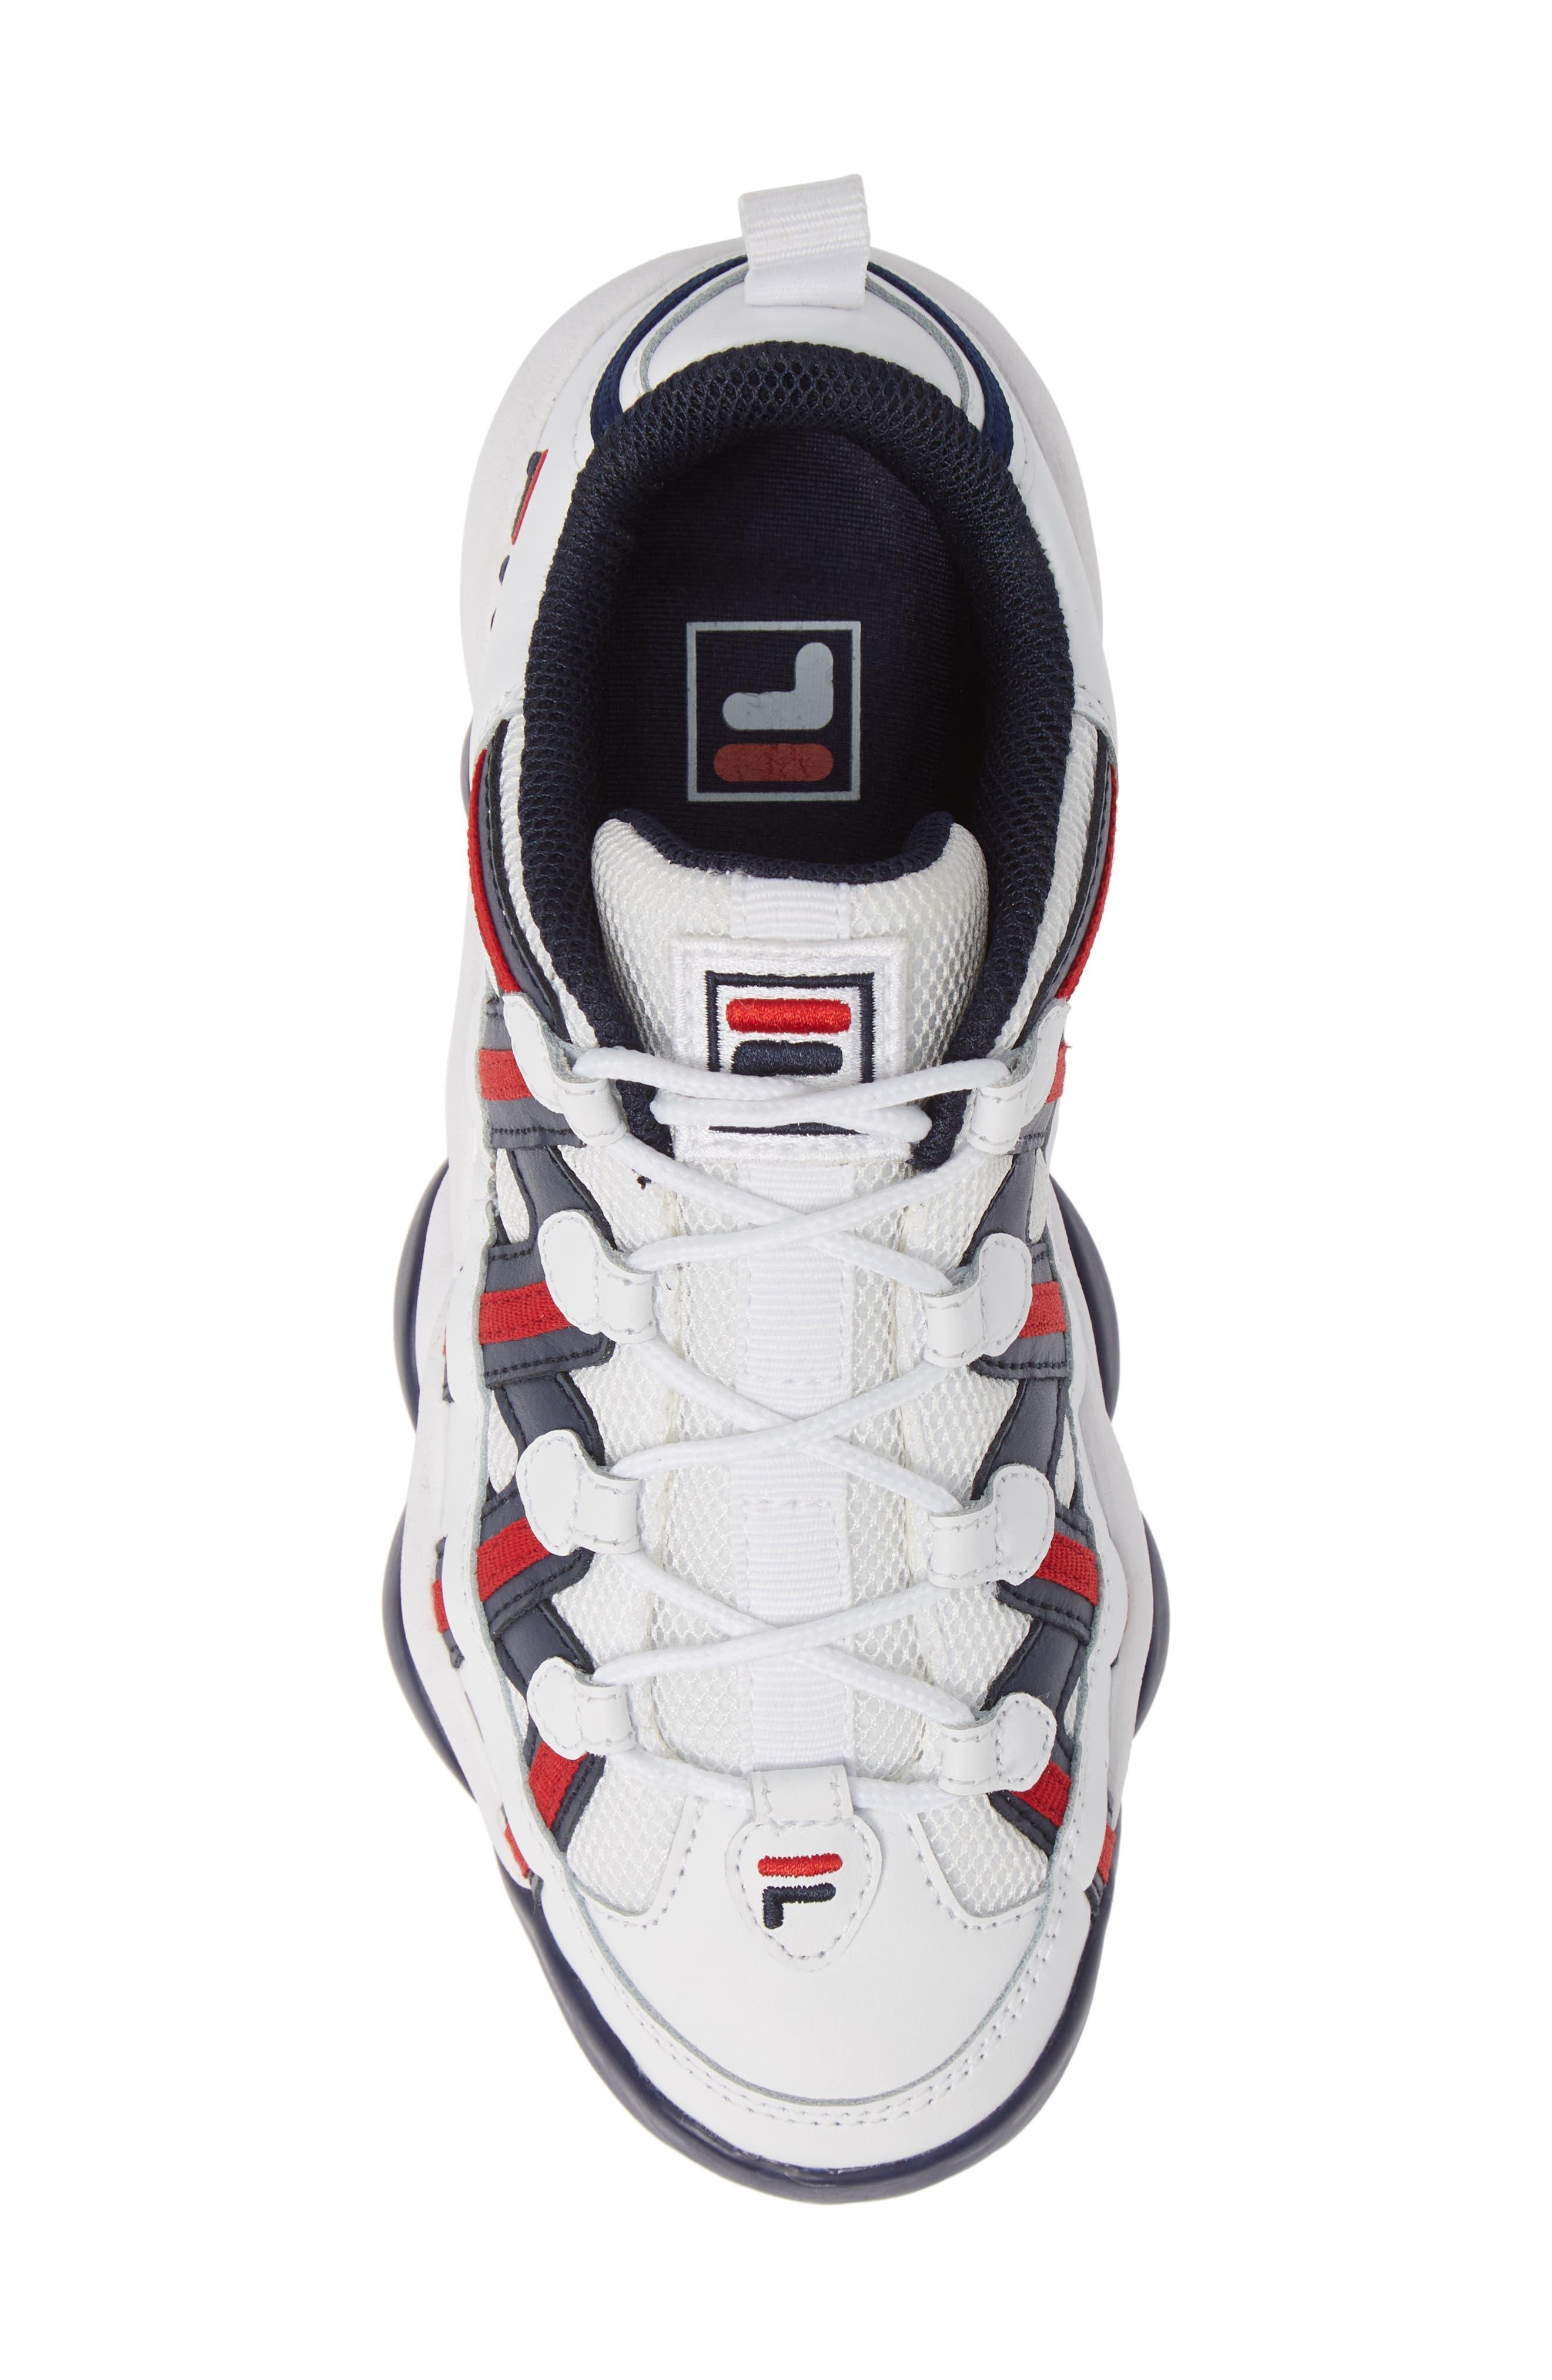 FILA, Spaghetti Low Sneaker, Alternate thumbnail 5, color, WHITE/ FILA NAVY/ FILA RED